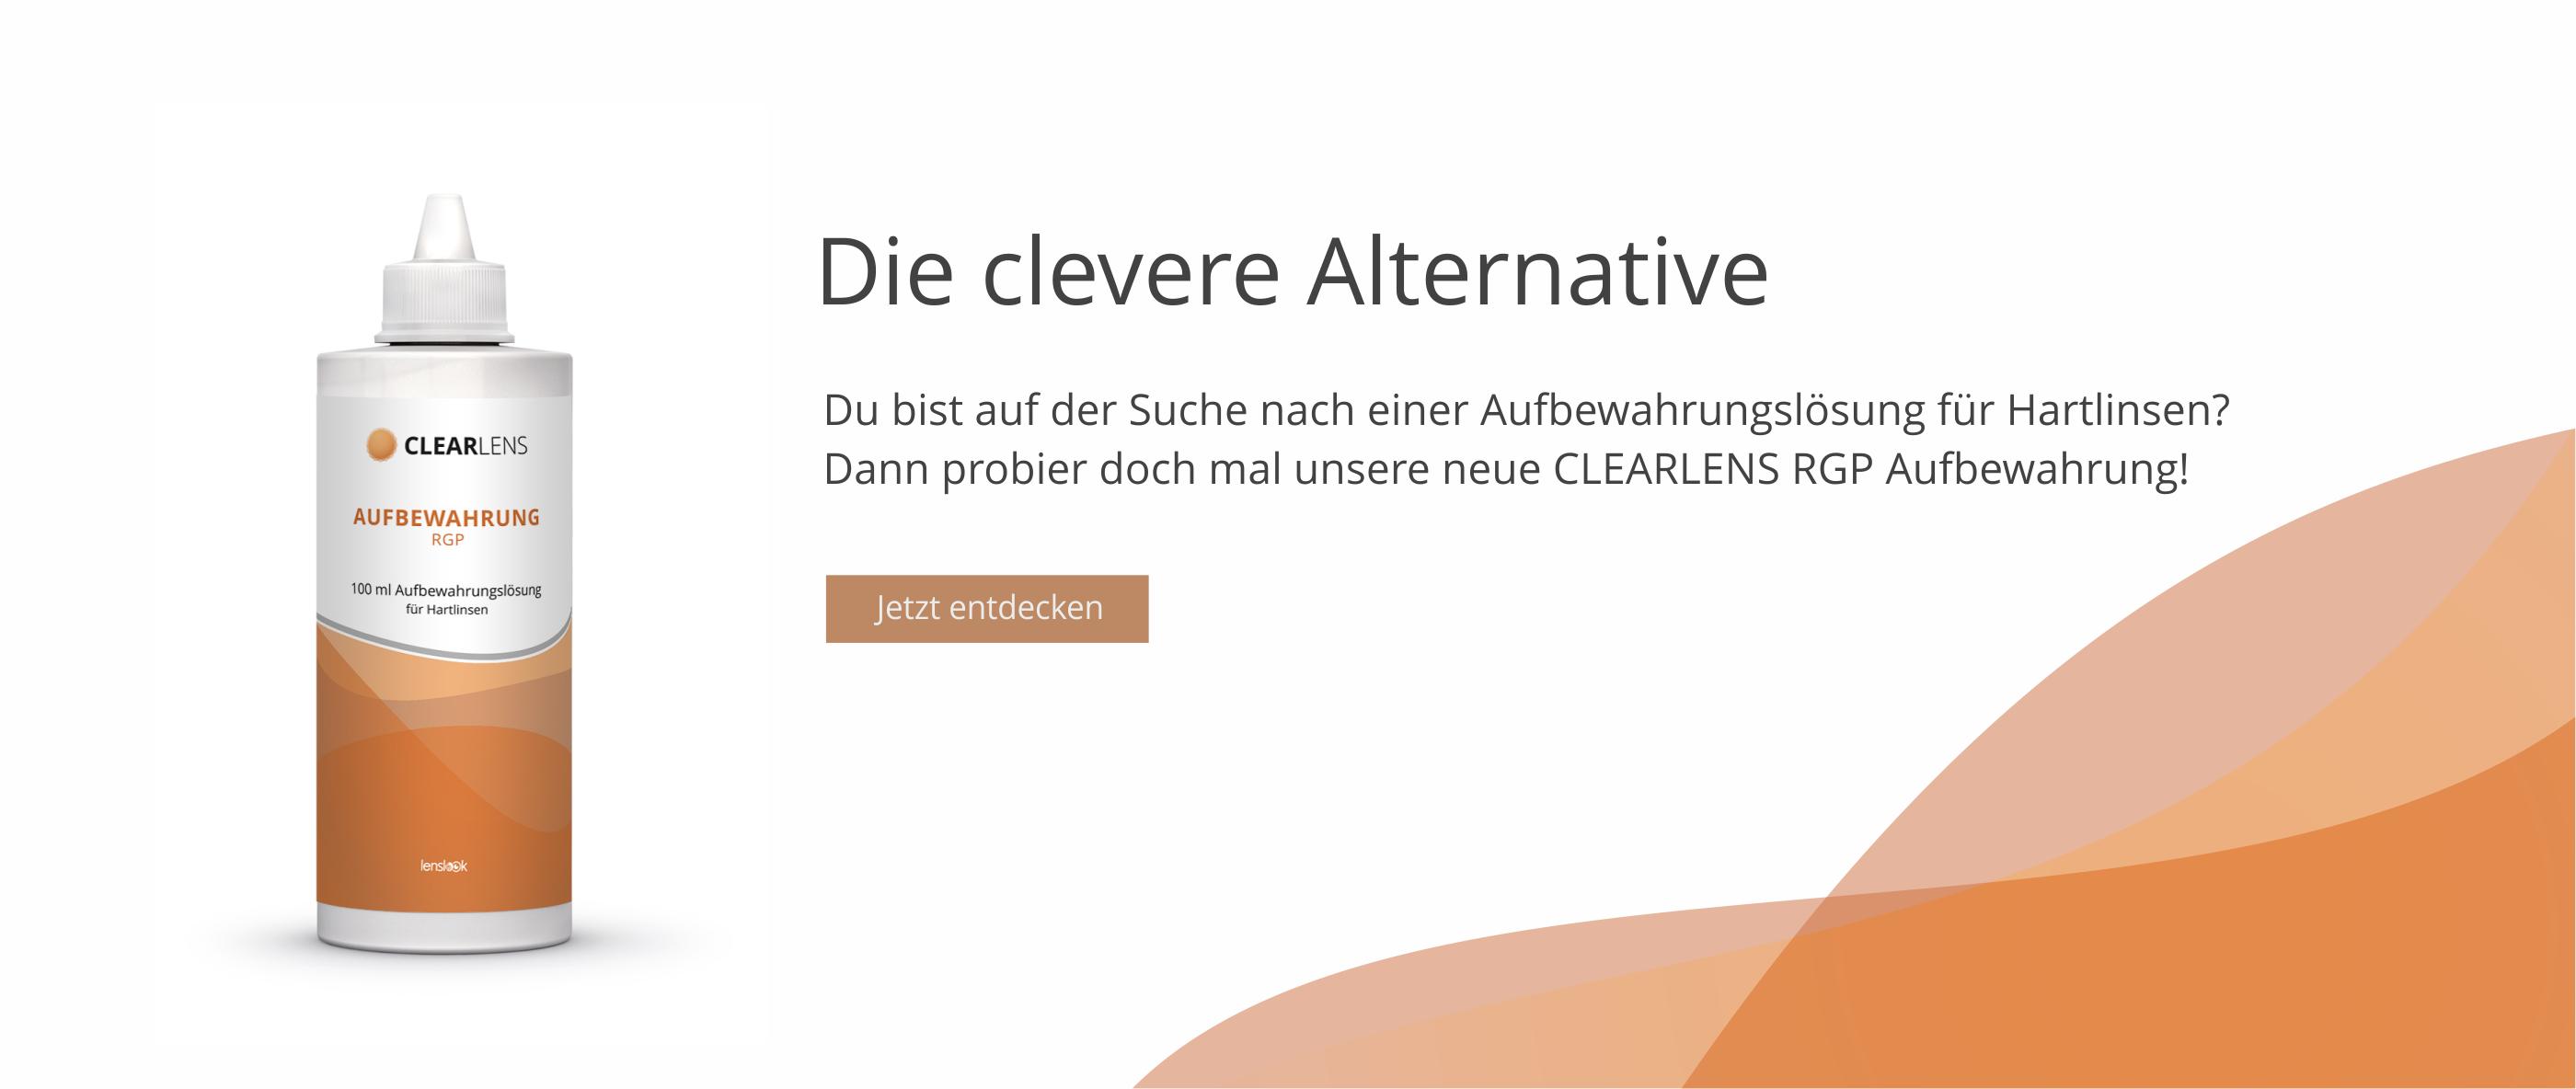 ClearLens_Alternative_RGP_Aufbewahrung_100ml